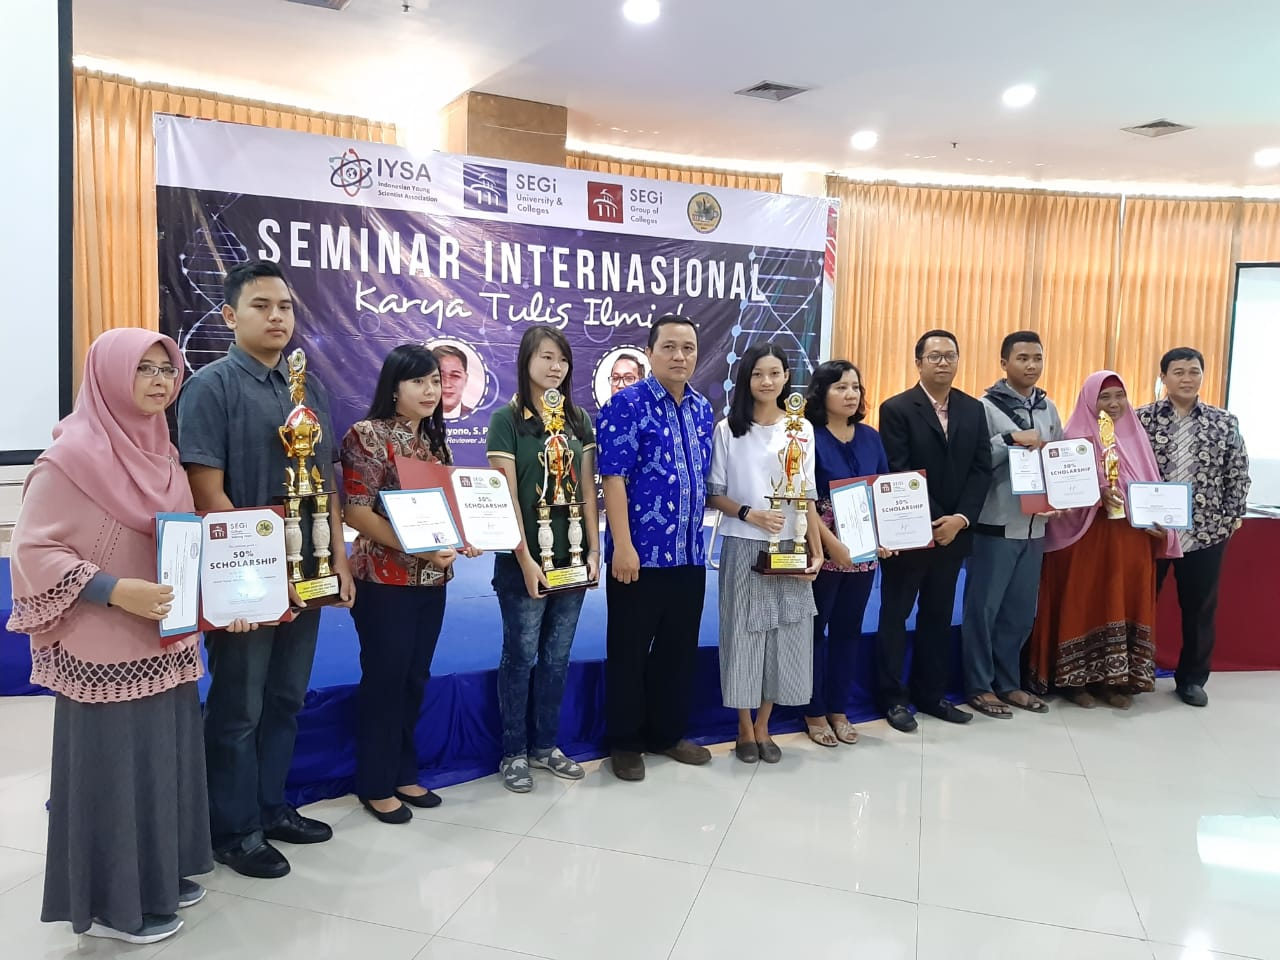 Seminar Internasional MGMP Biologi SEGi University Tryout Online